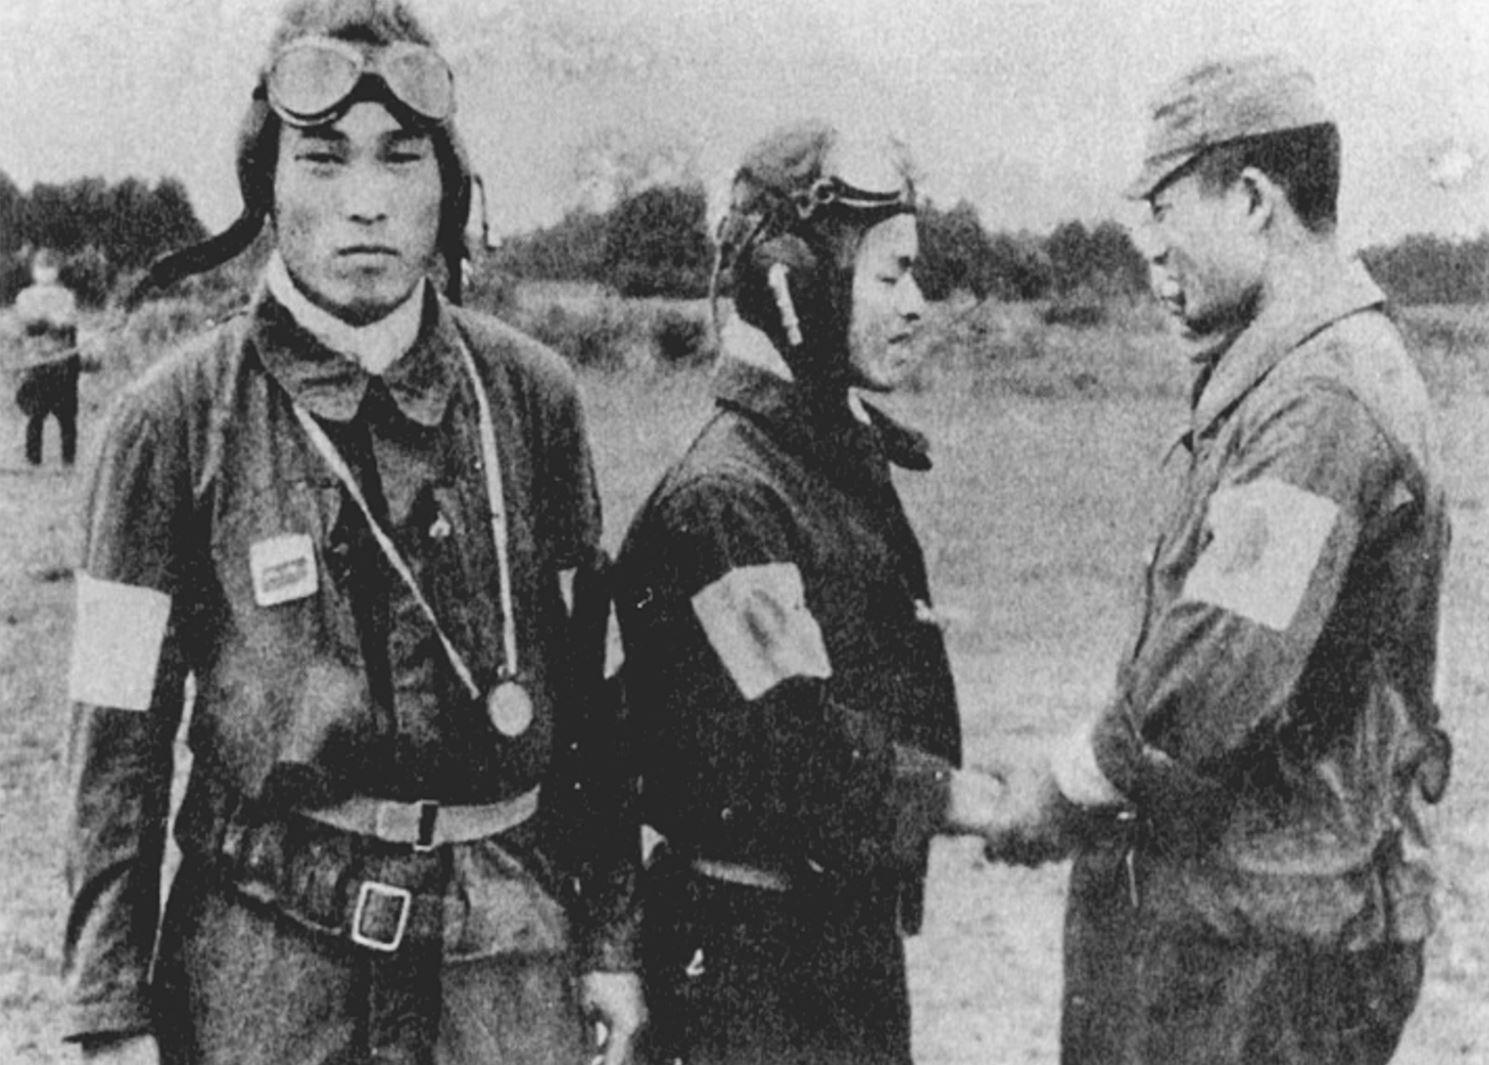 Cockpit-Uhren-Japan-WW2-1